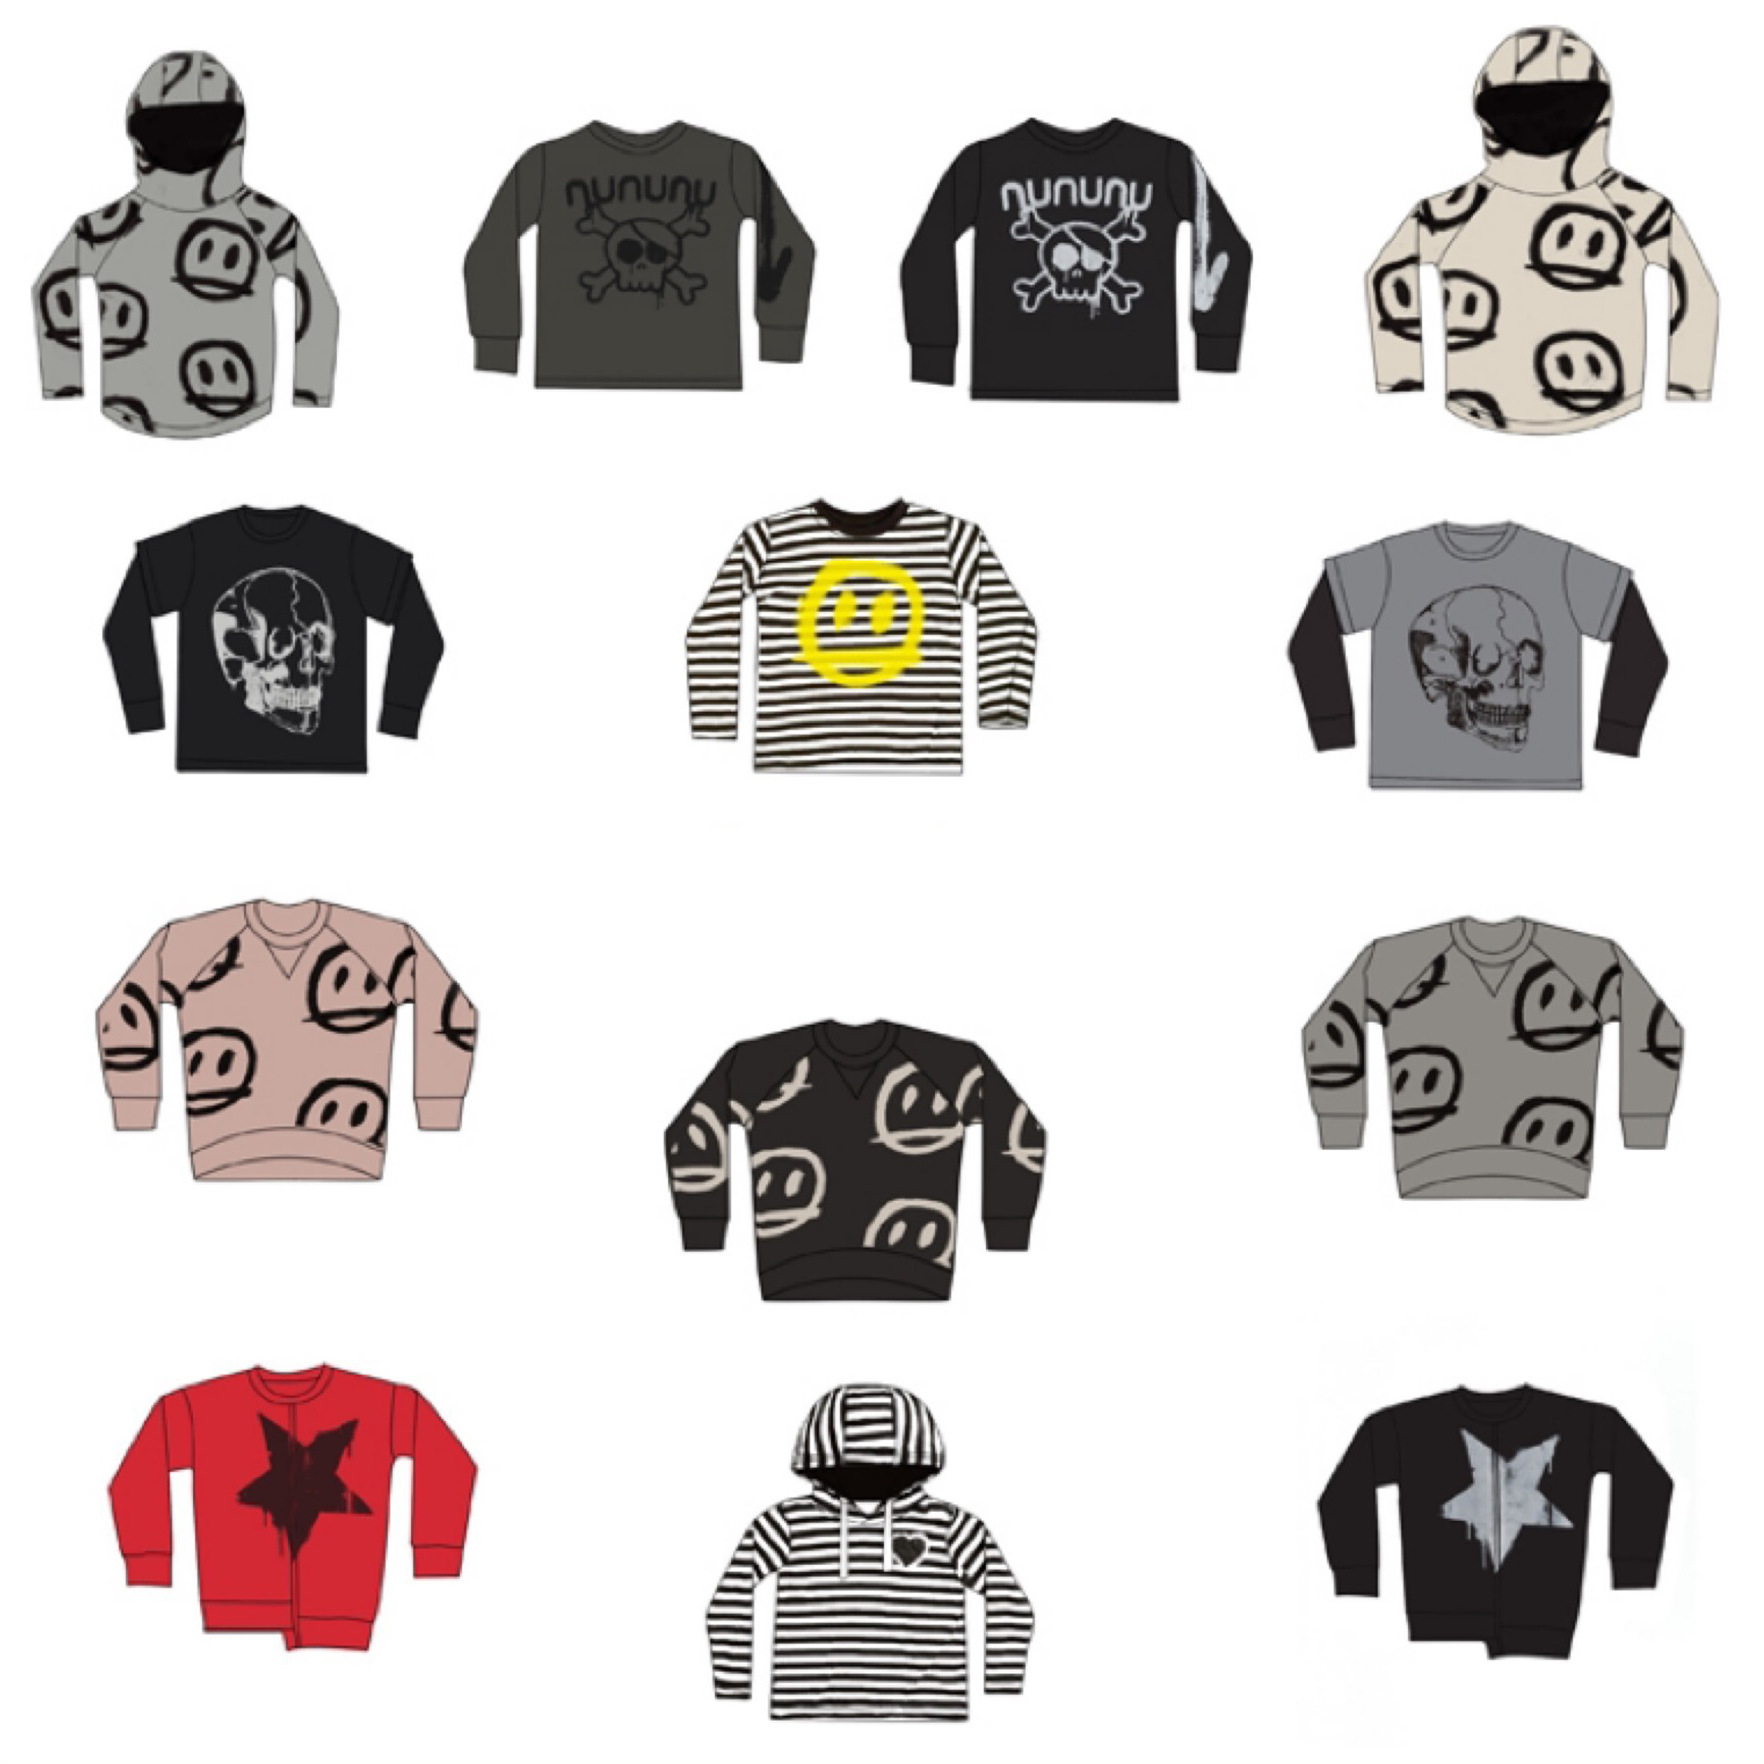 Kids T Shirts 2021 New Spring Summer NX Brand Design Boys Girls Skull Print Long Sleeve Top Baby Children Cotton Fashion Clothes 1